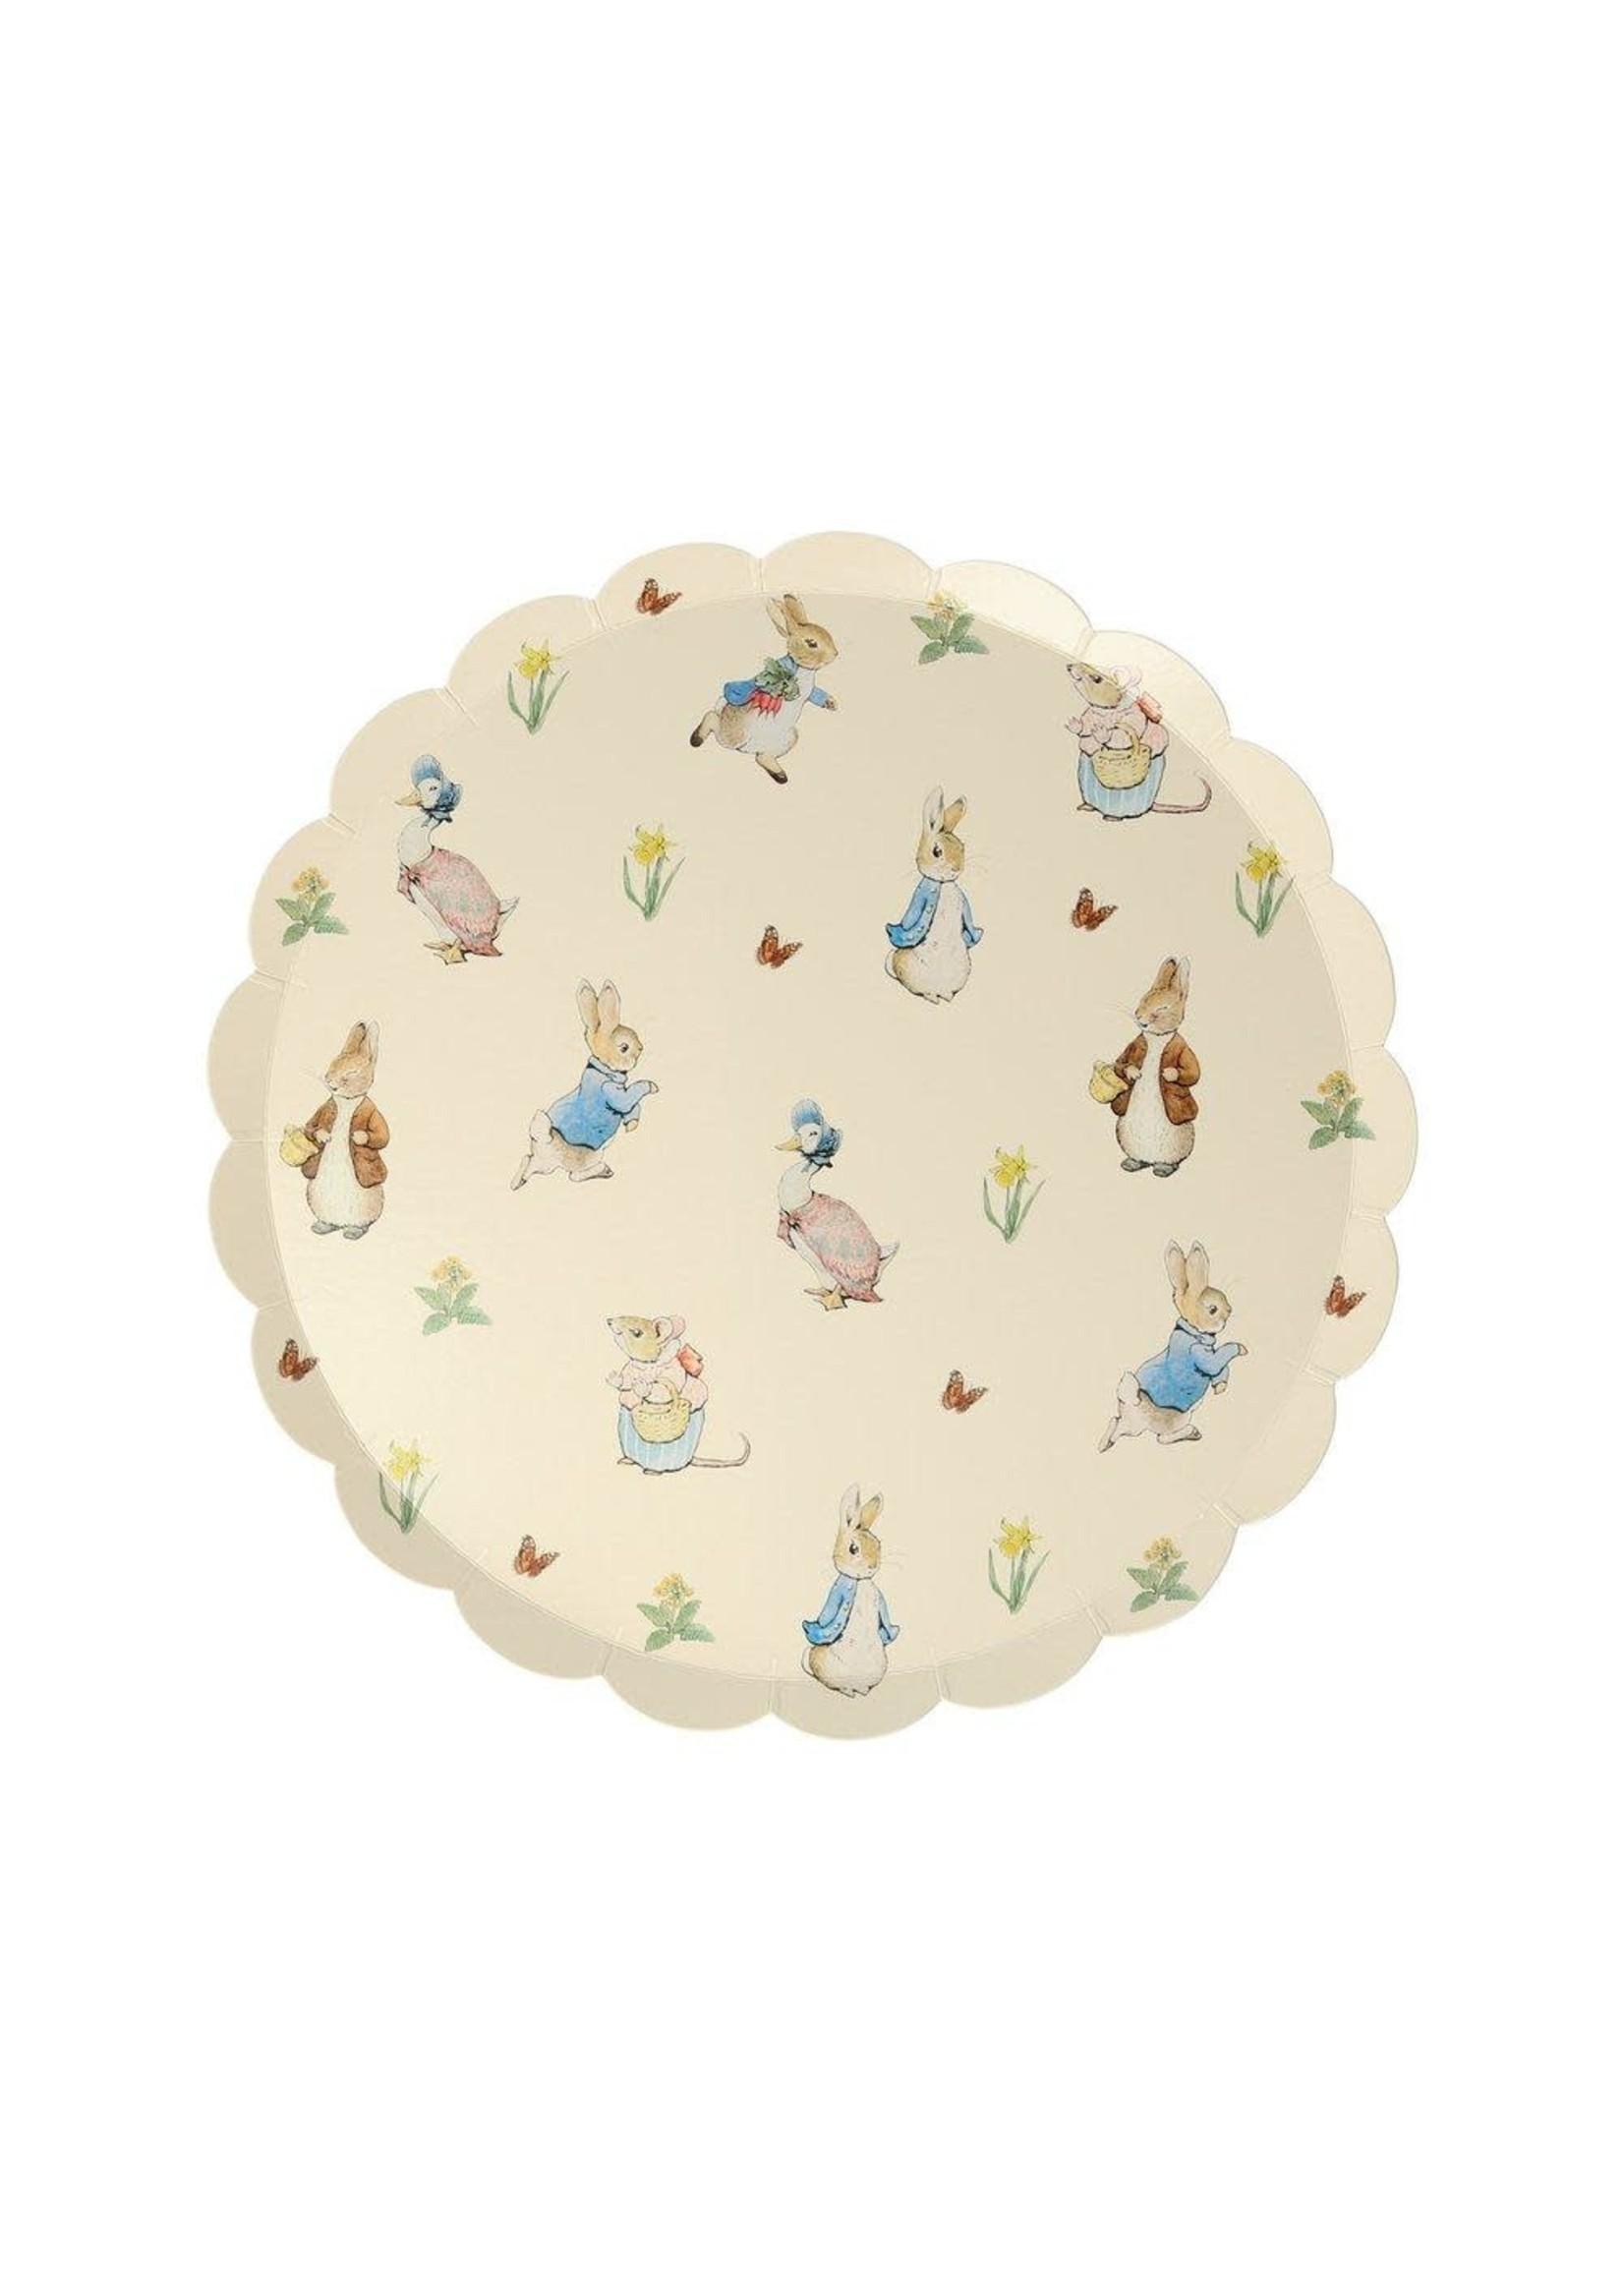 Meri Meri Paper Plates - Peter Rabbit & Friends Side Plate